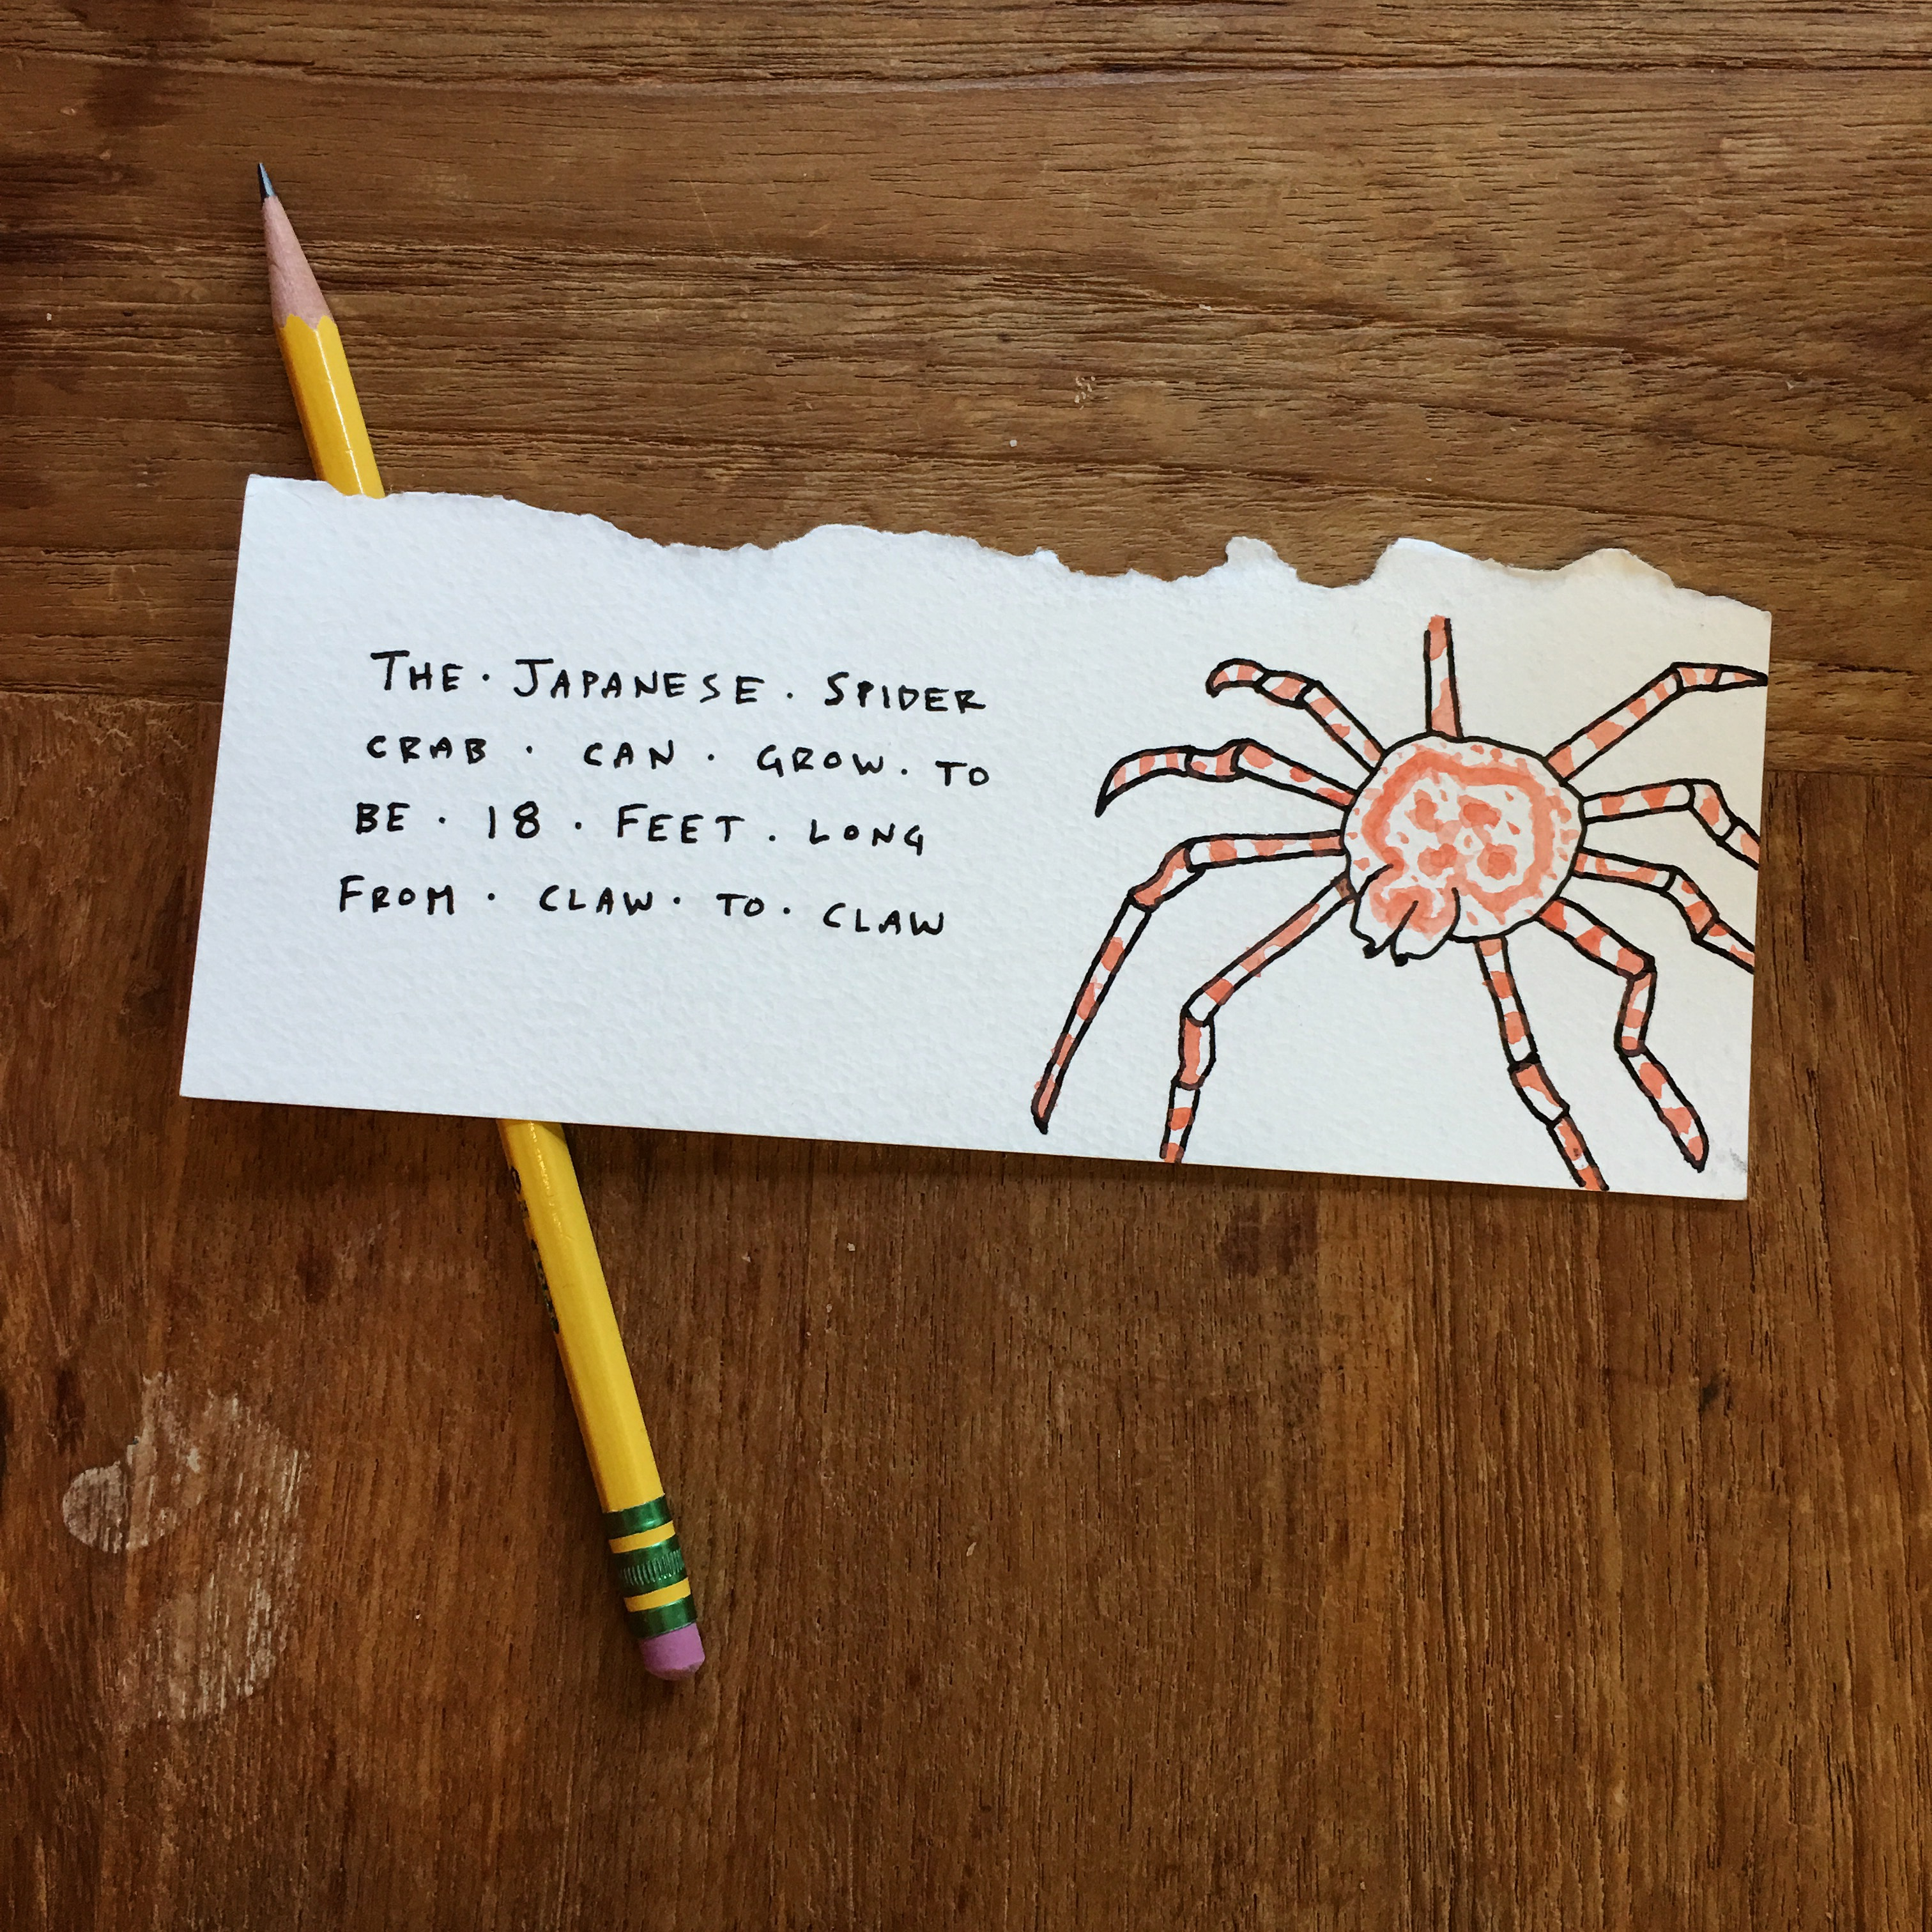 filejapanese spider crabjpg